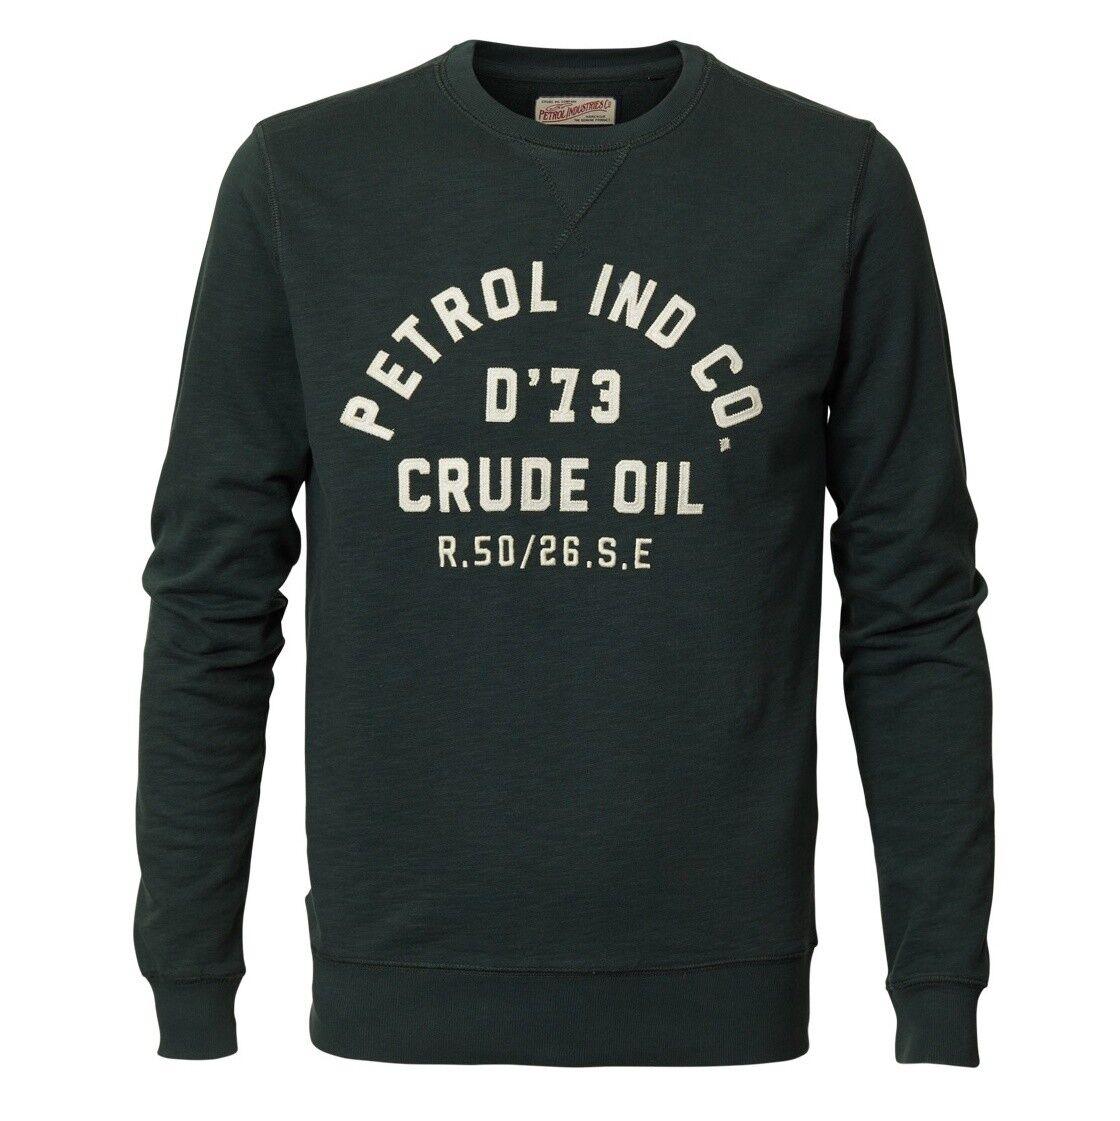 PETROL INDUSTRIES Sweatshirt Sweater bottle Grün M-FW18-SWR363